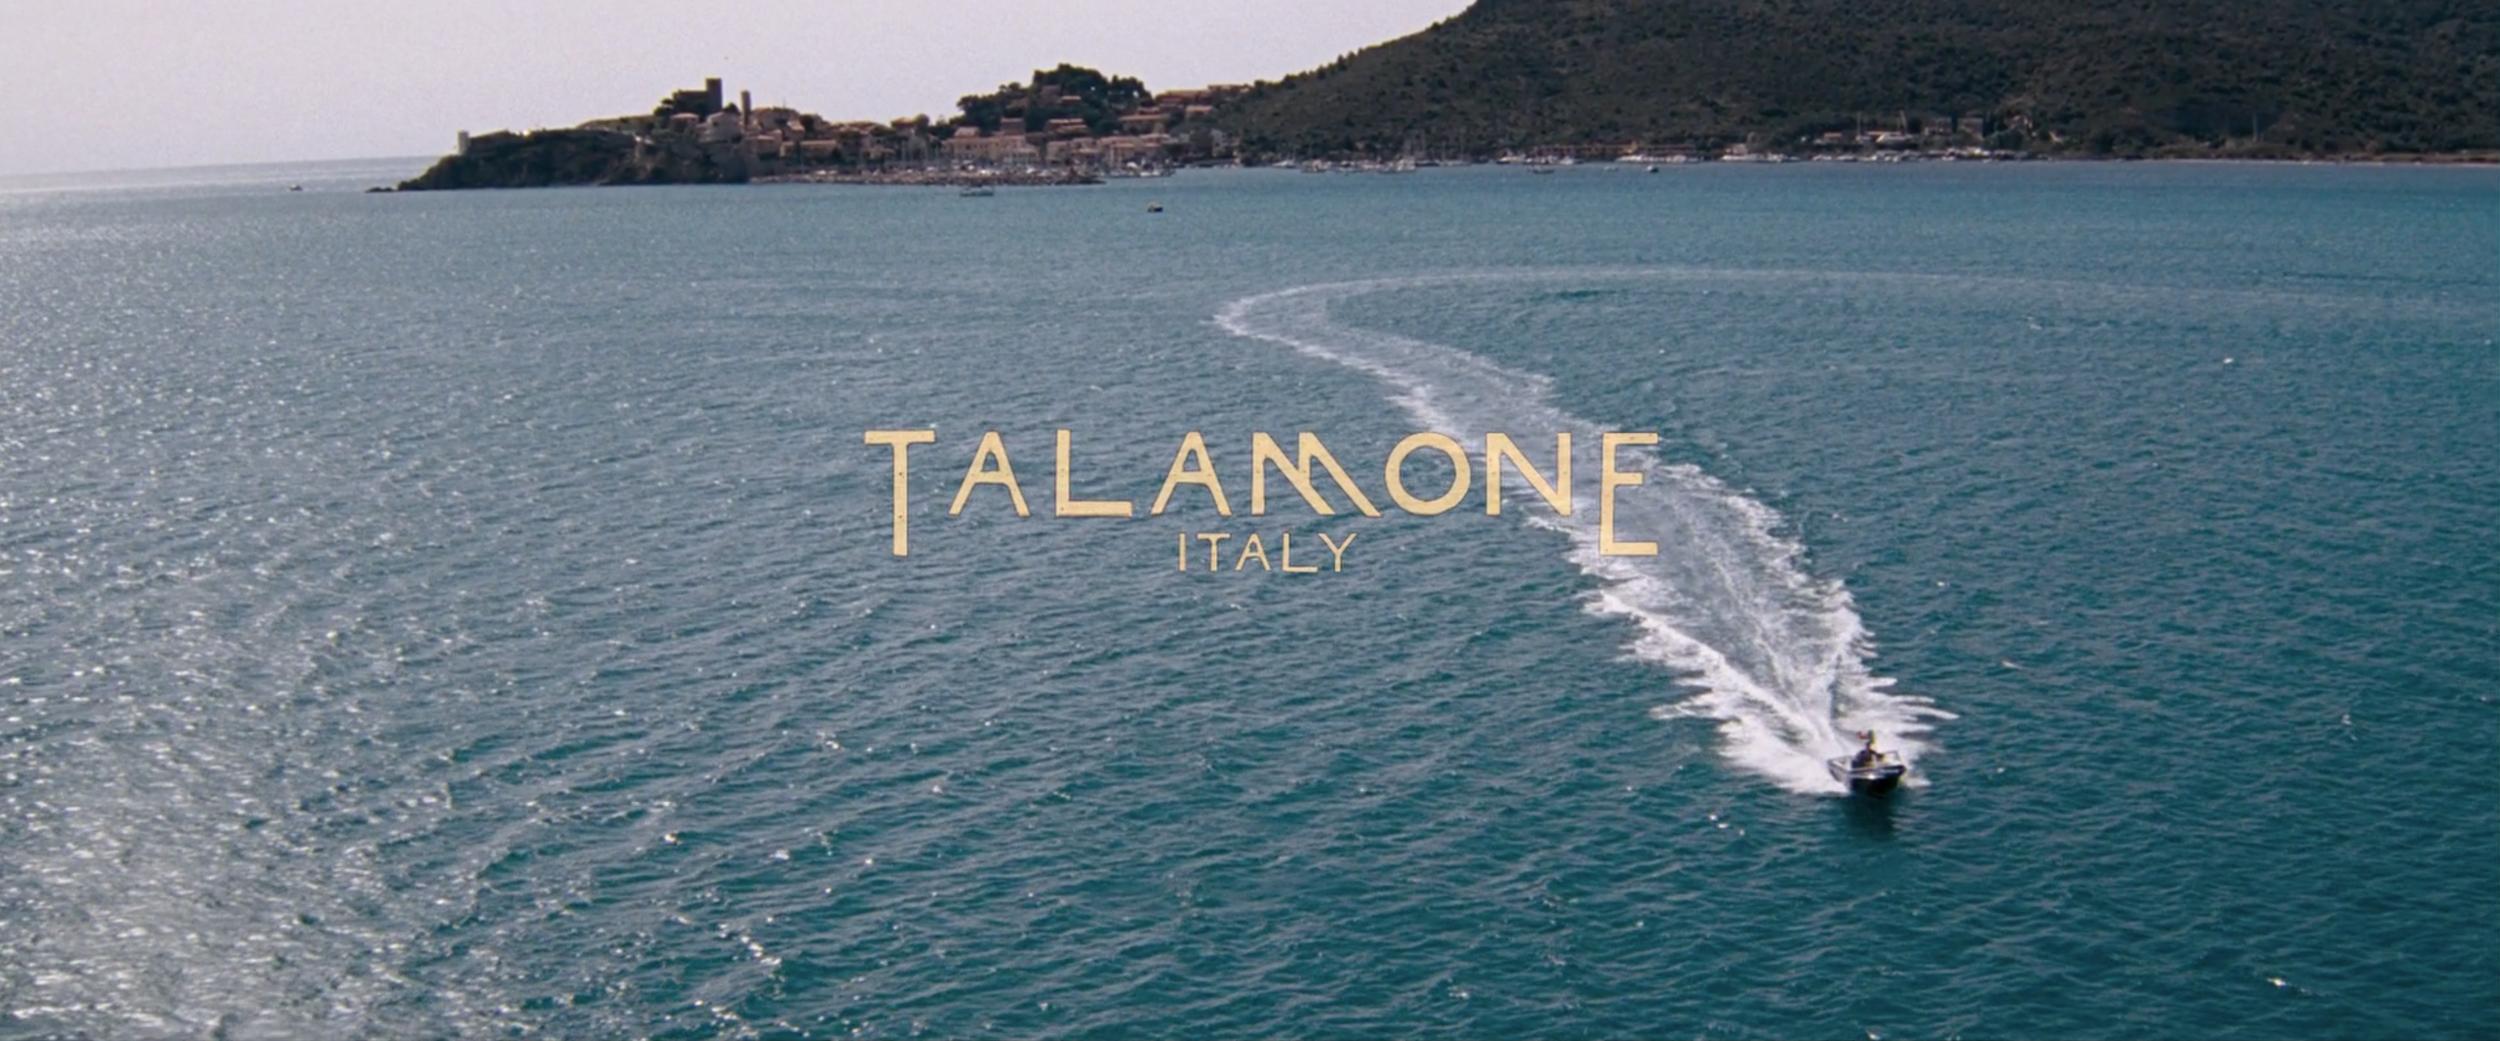 QOS-Talome-Italy.png